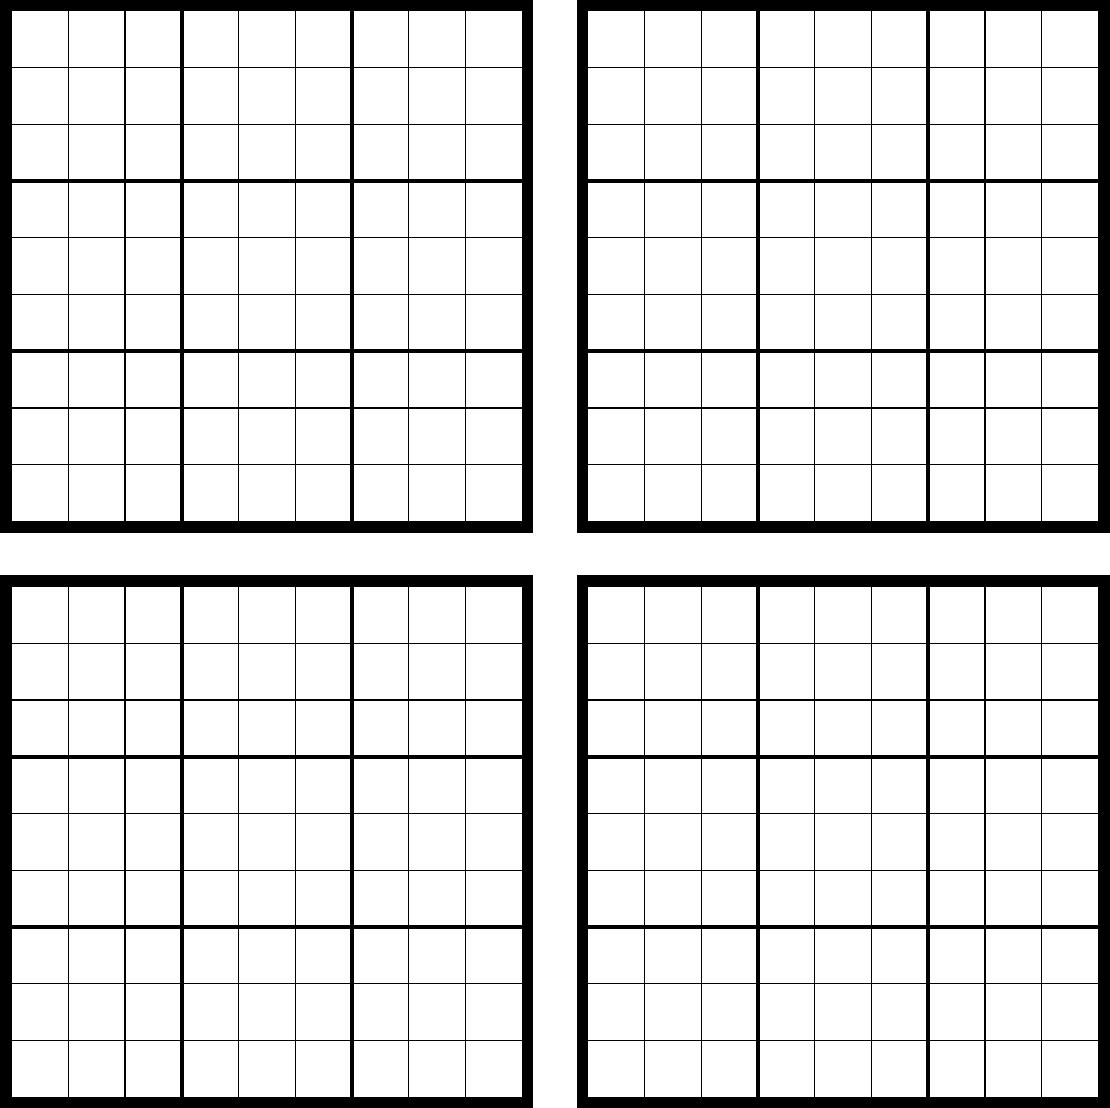 Sudoku Blank - Karan.ald2014